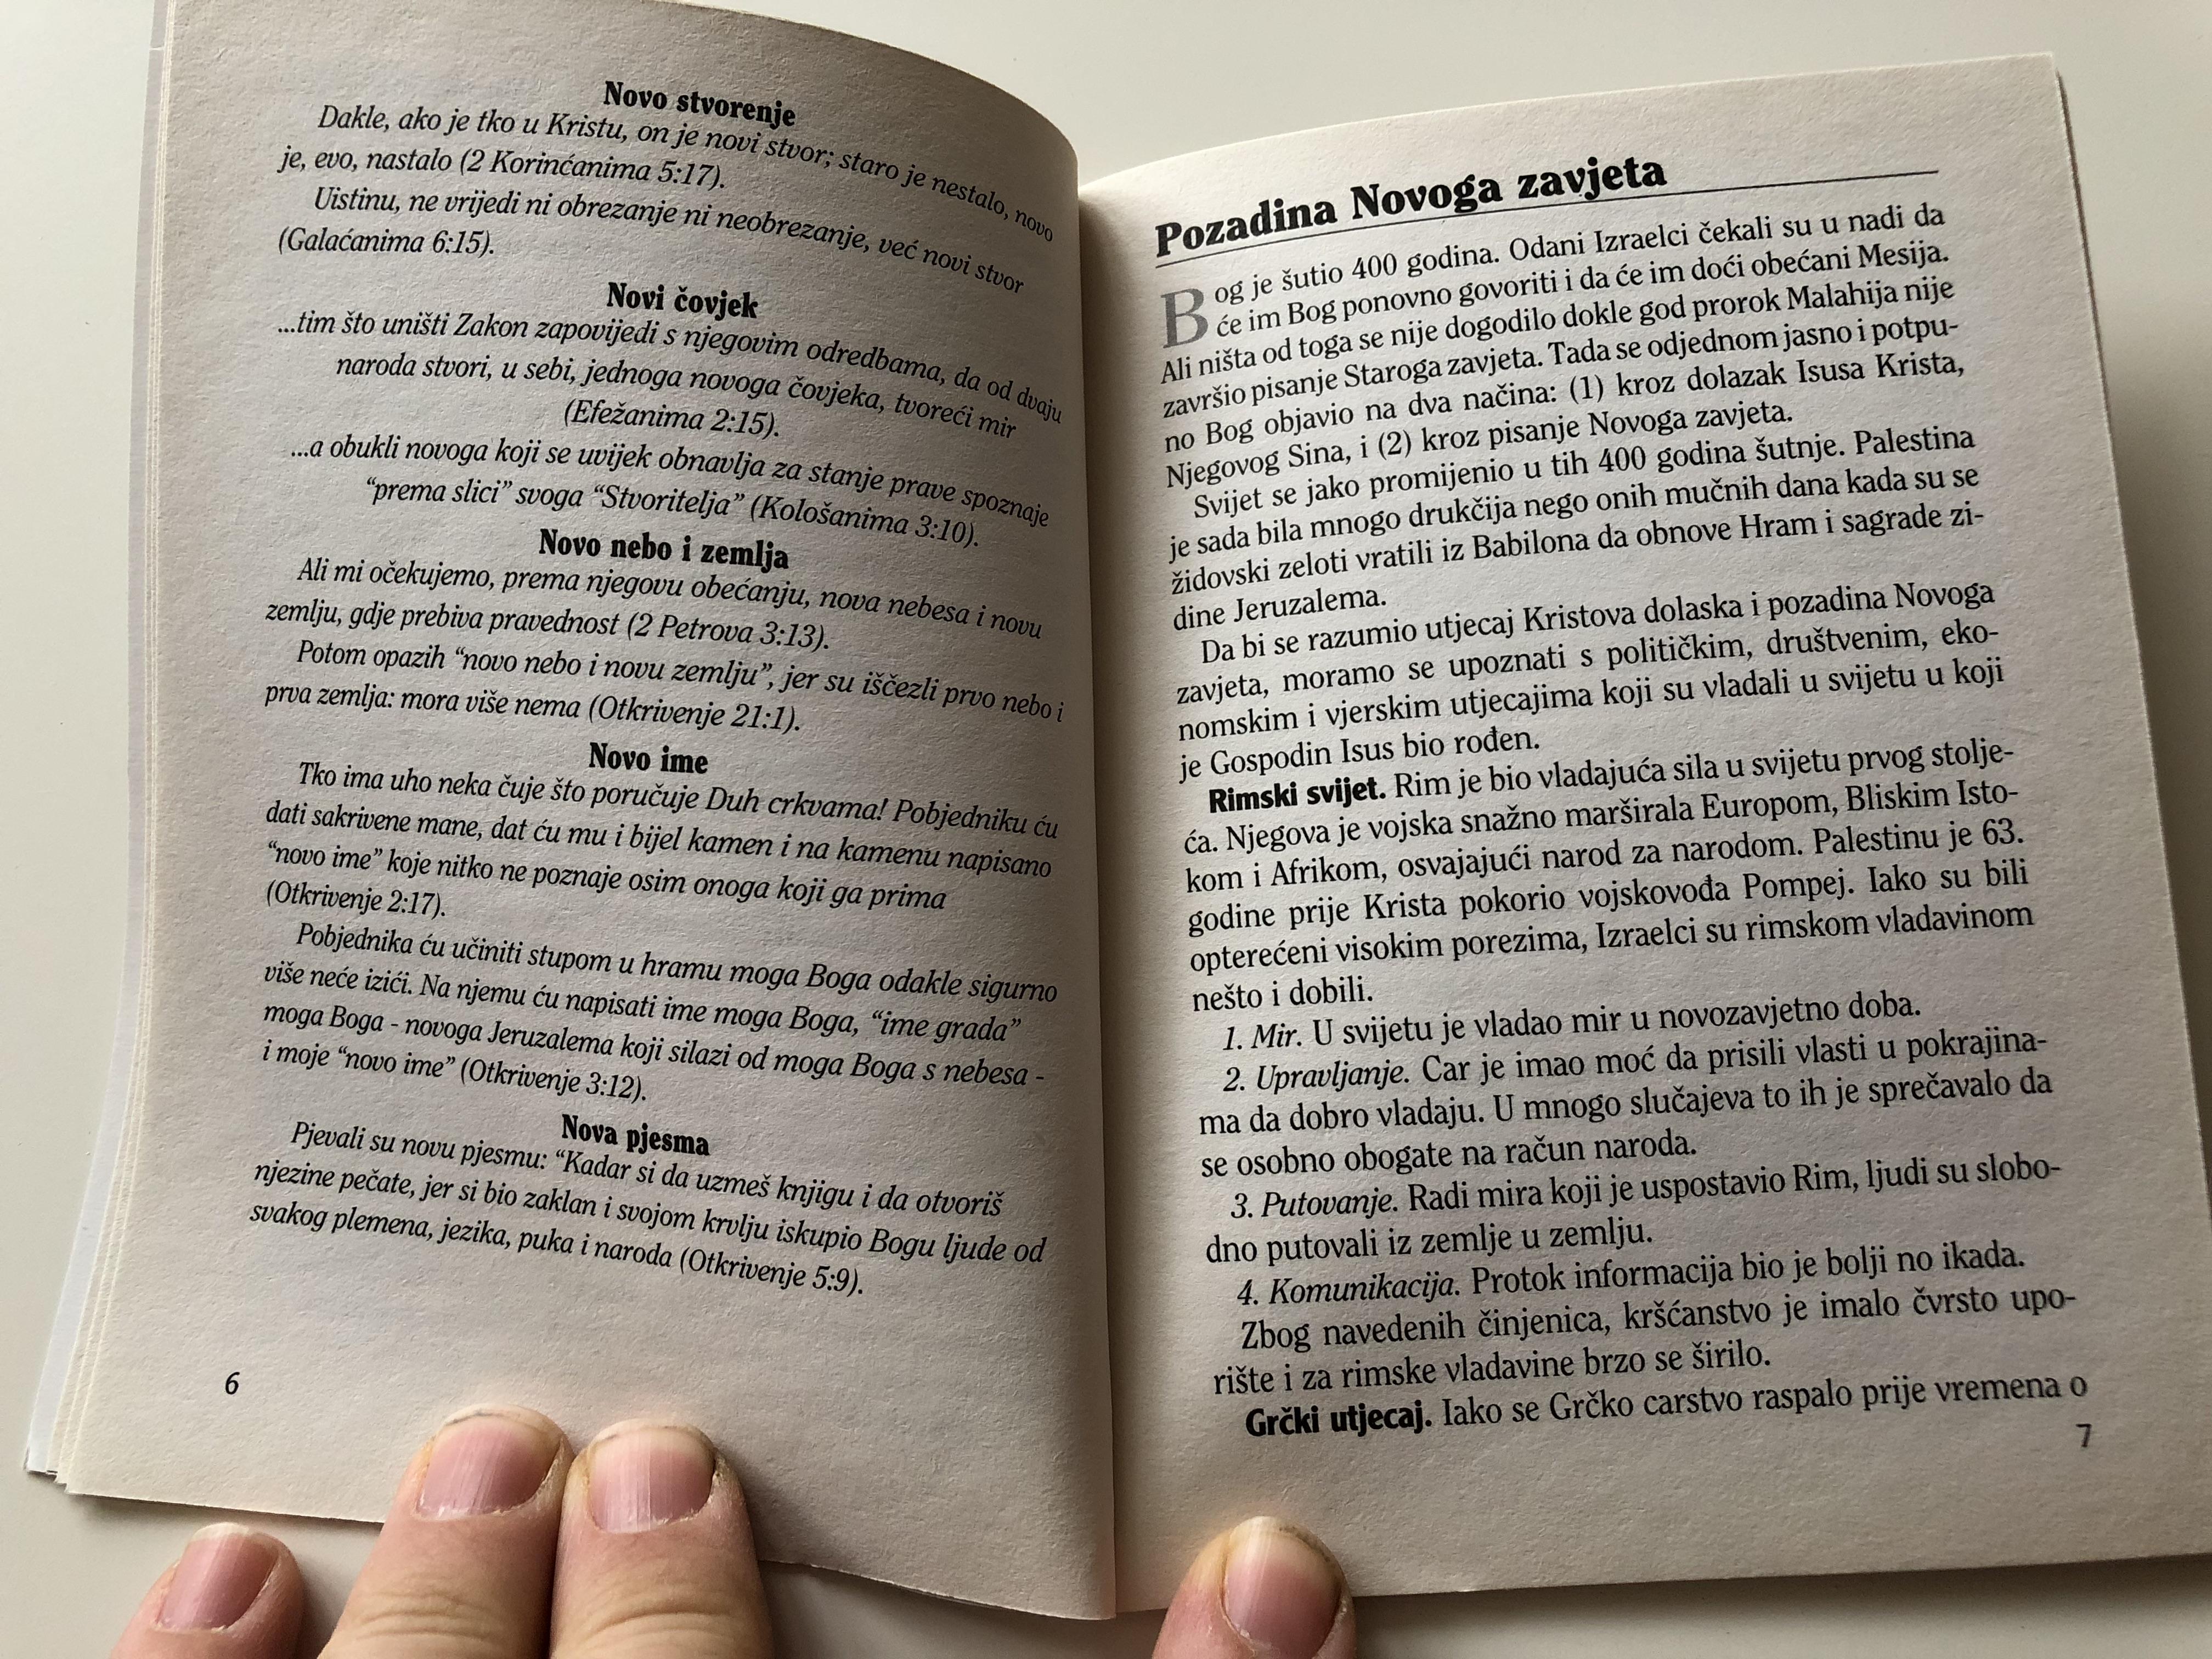 upoznati-boga-kroz-novi-zavjet-croatian-language-booklet-knowing-god-through-the-new-testament-david-egner-paperback-2004-4-.jpg